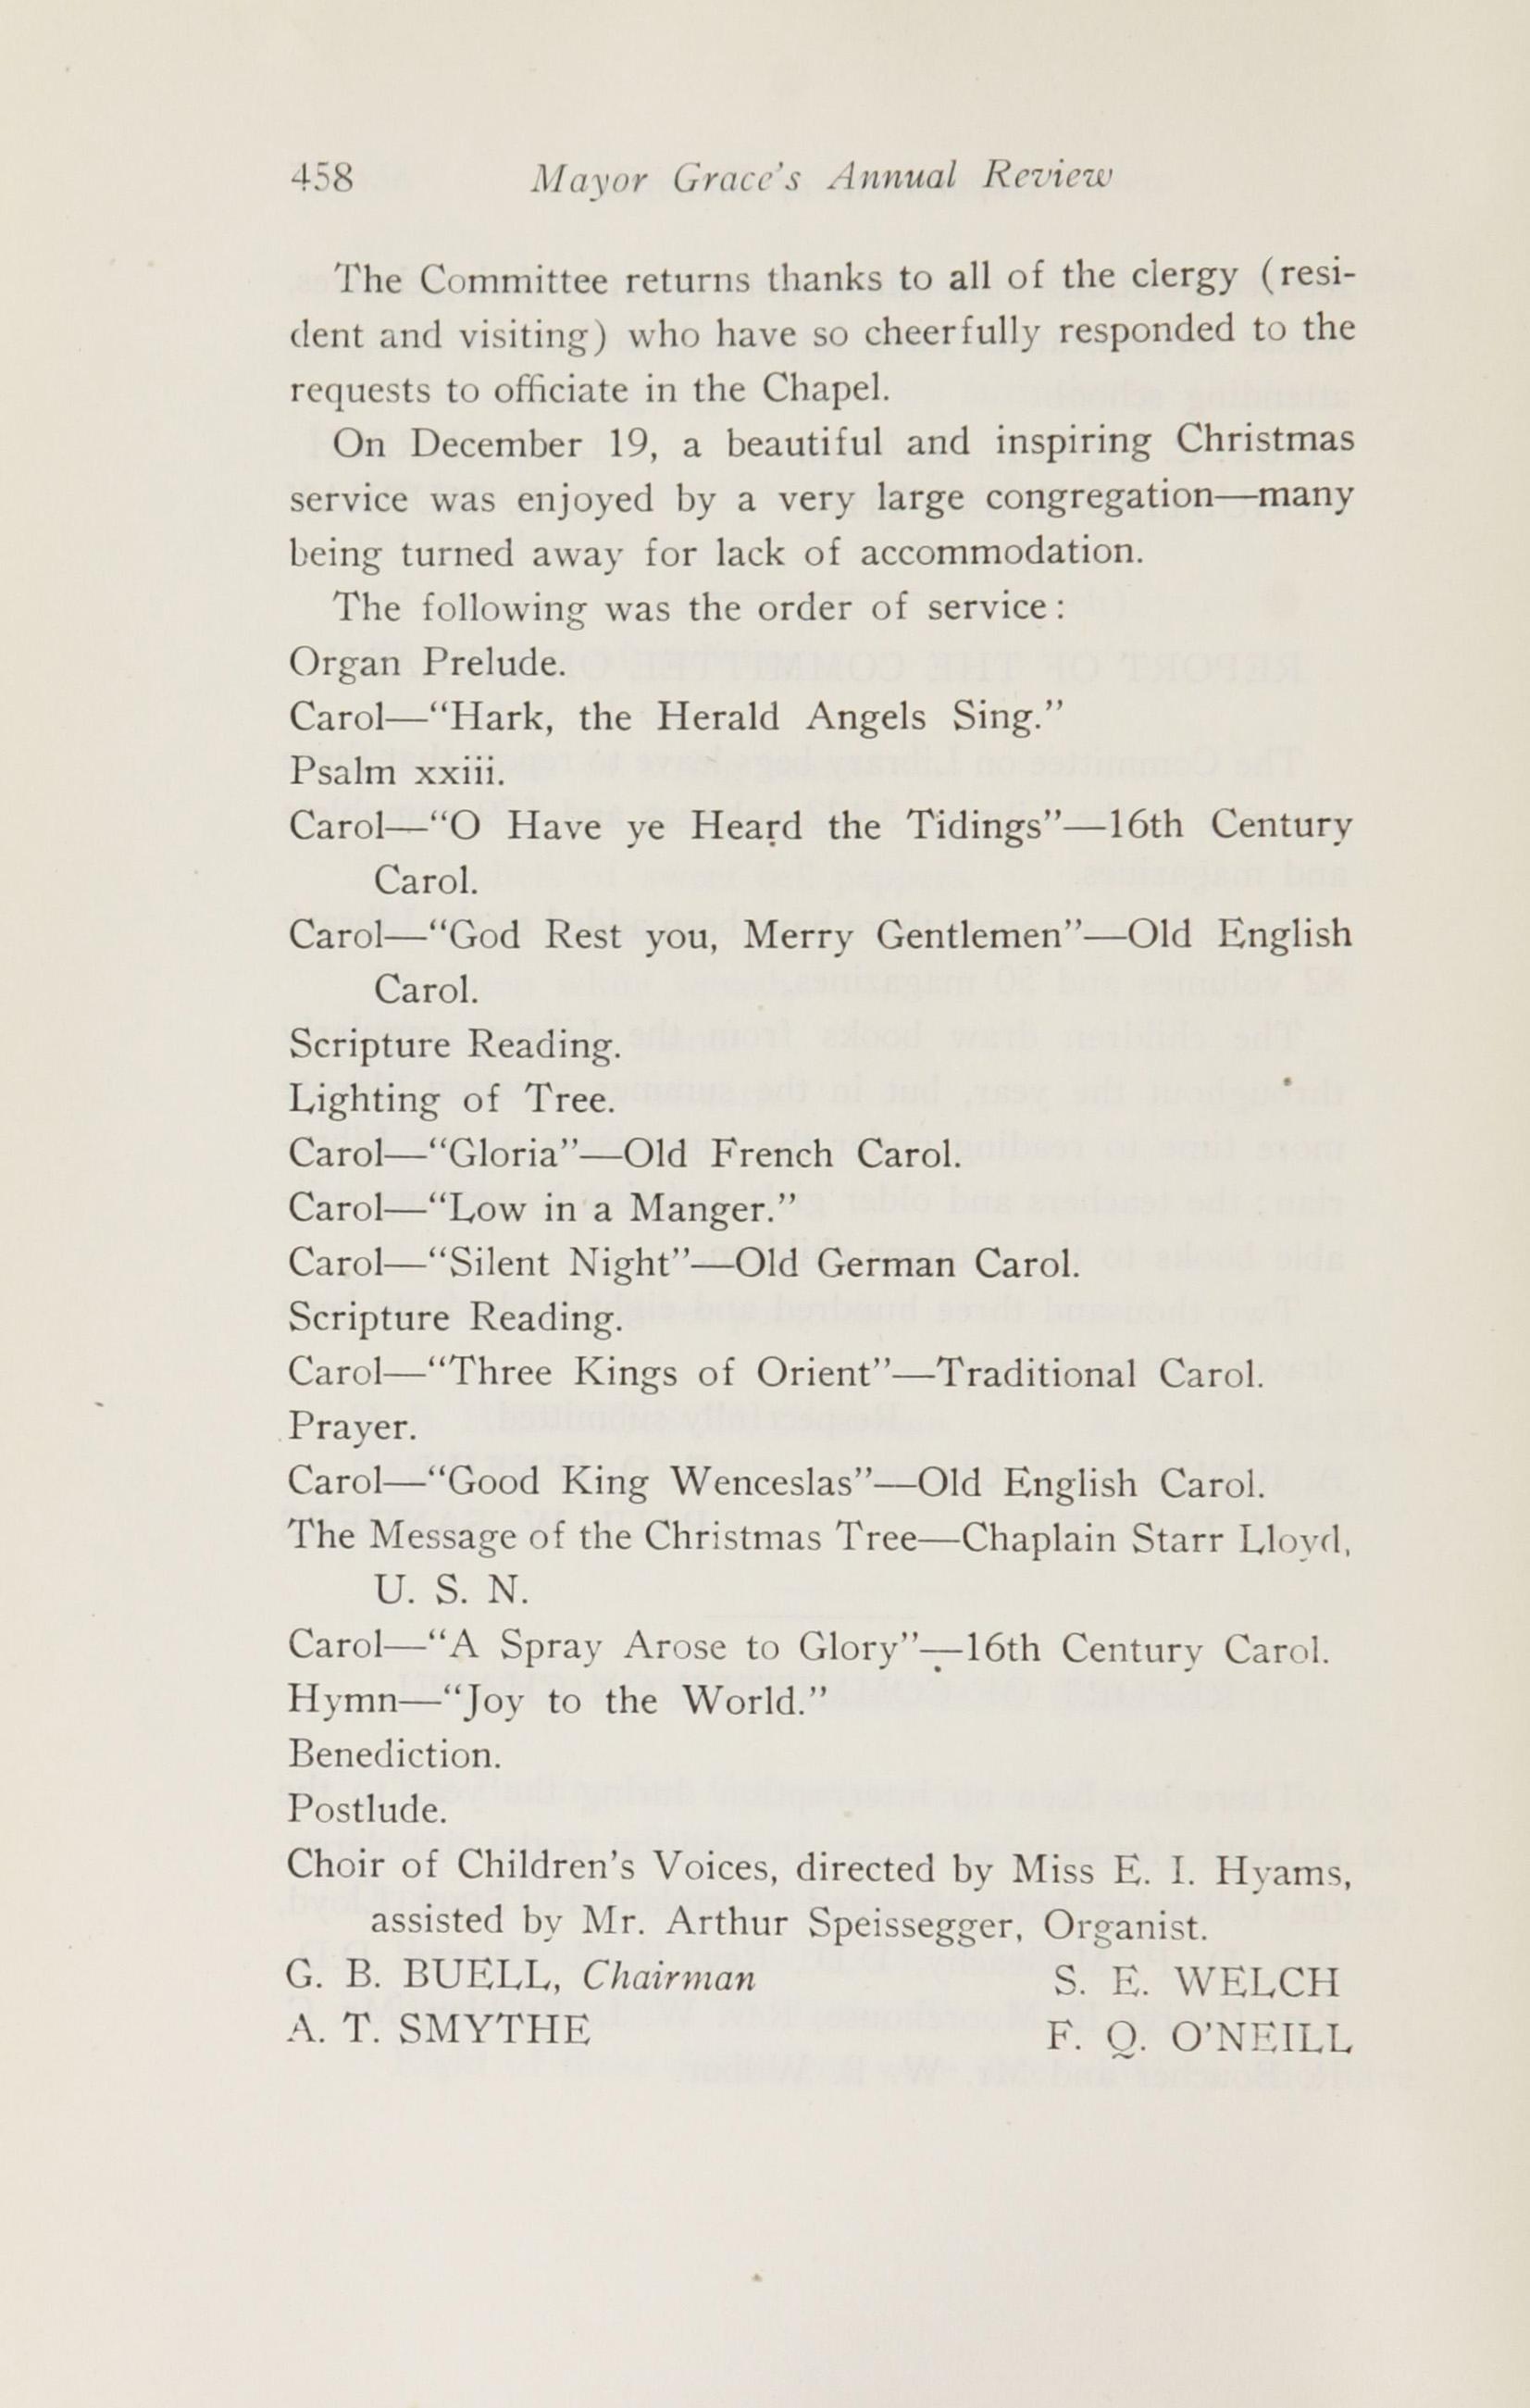 Charleston Yearbook, 1920, page 458